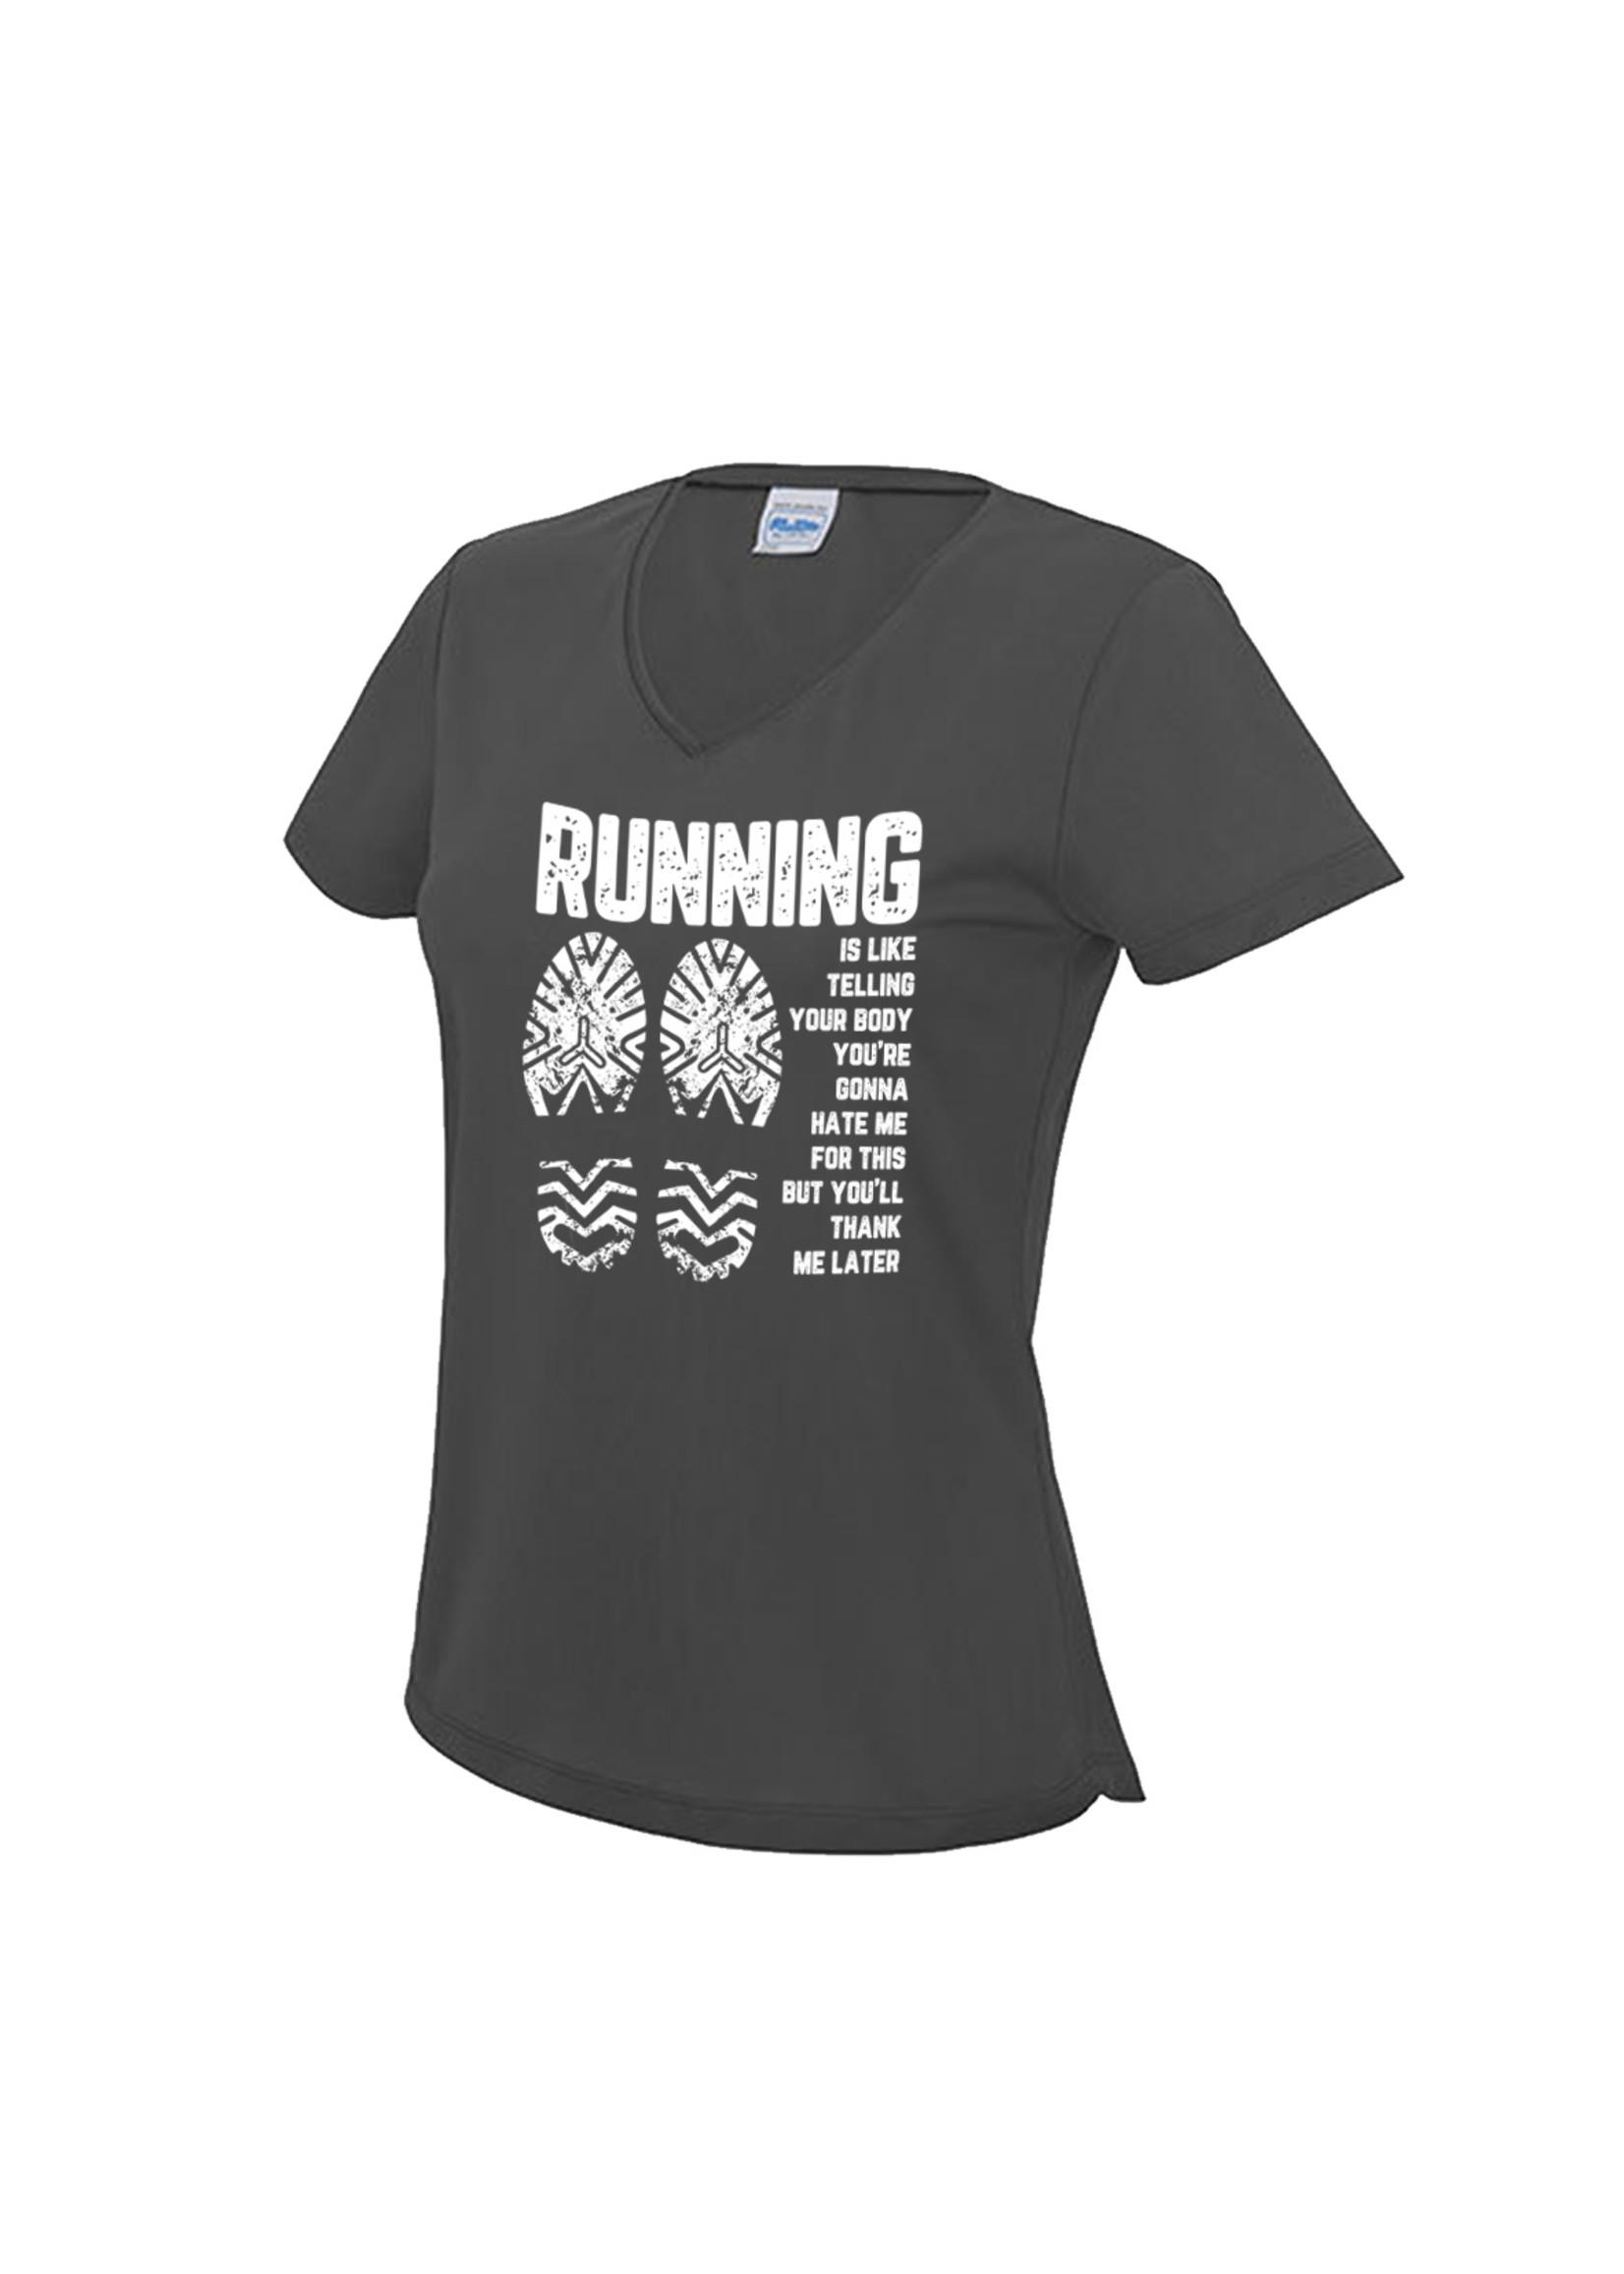 Hardloopshirt  met v-hals- Running is like telling your body